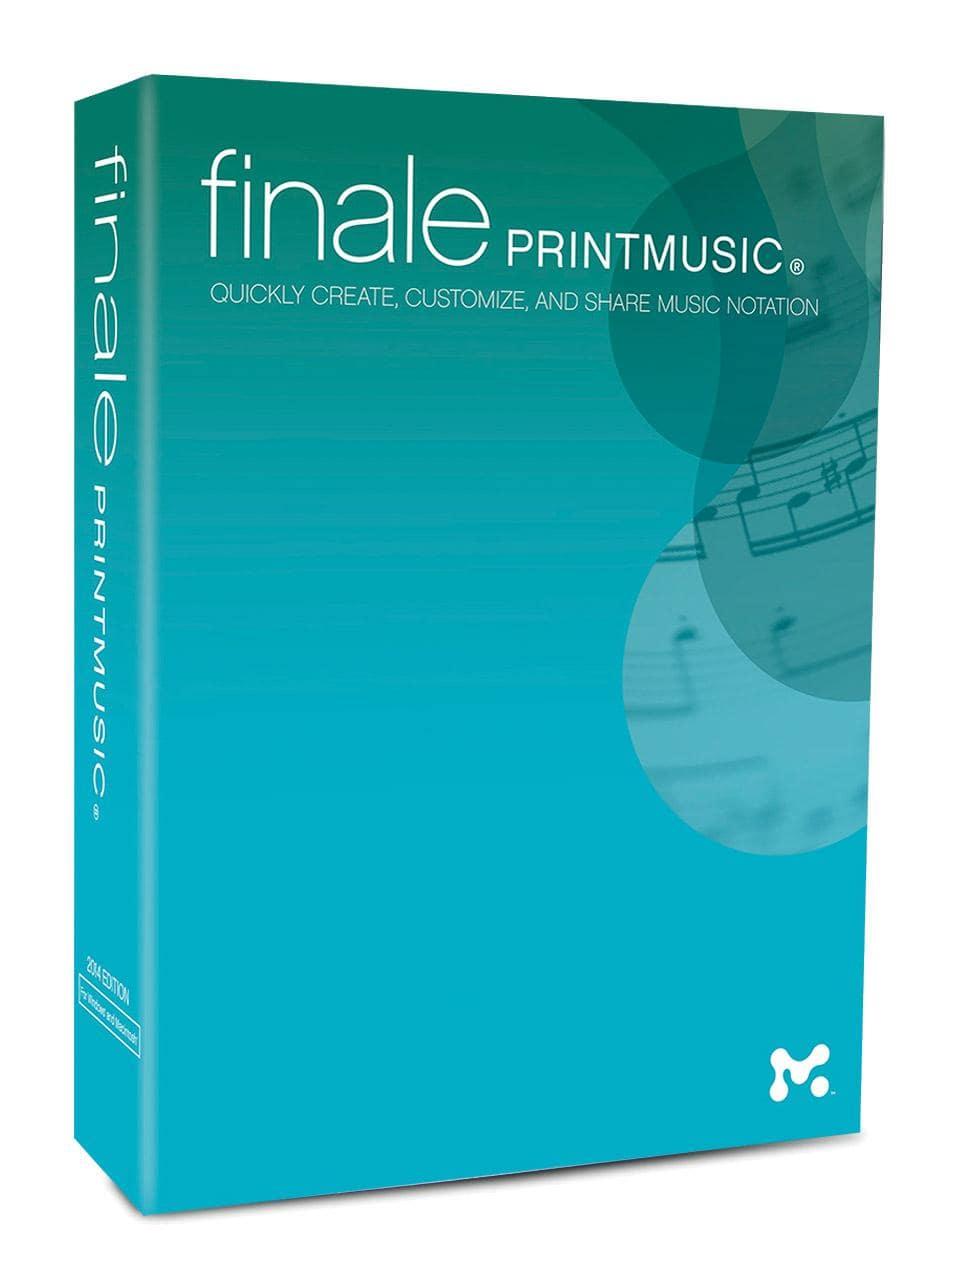 Studiosoftware - Makemusic Finale PrintMusic 2014 D - Onlineshop Musikhaus Kirstein